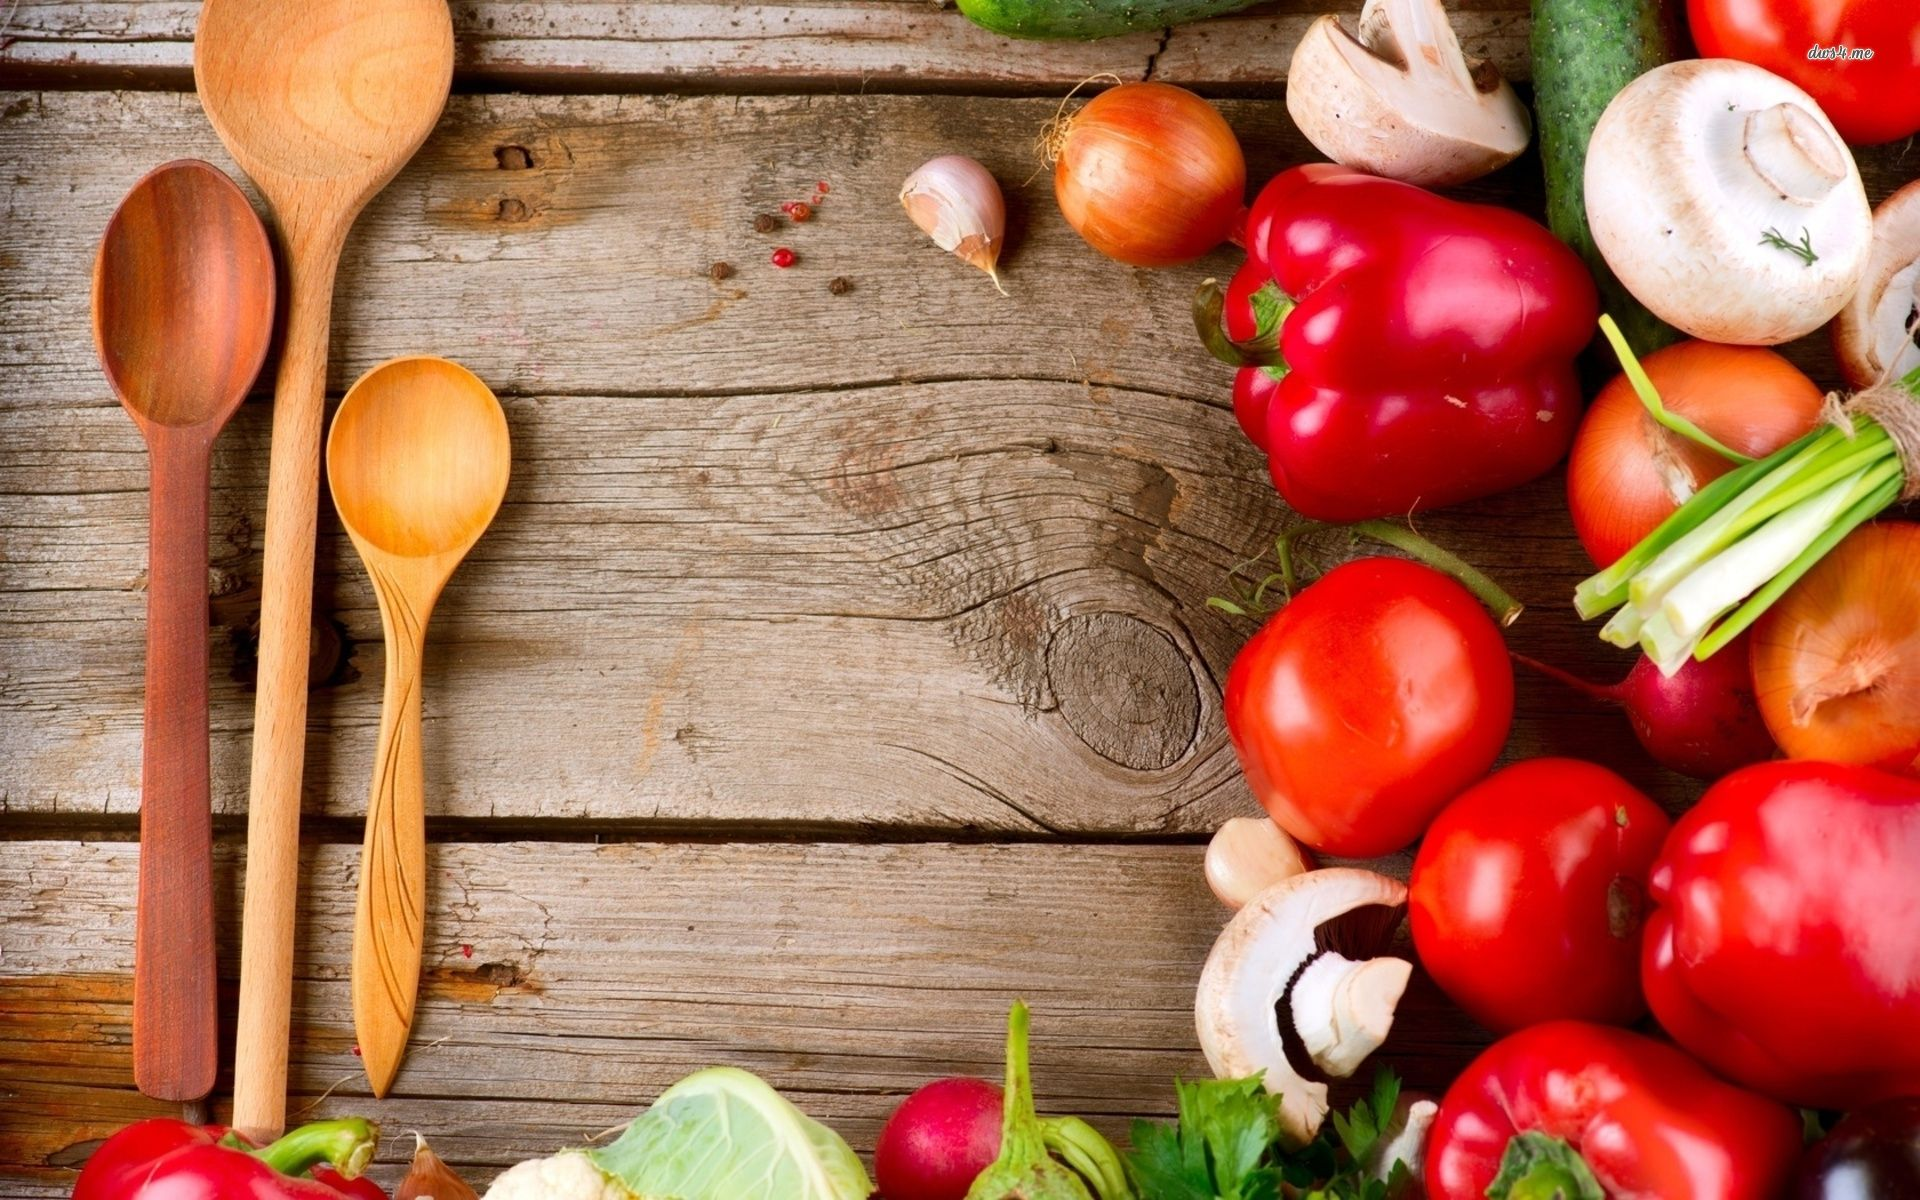 Vegetables Hd Wallpaper Vegetables Vegan Kitchen Vegan Food Truck